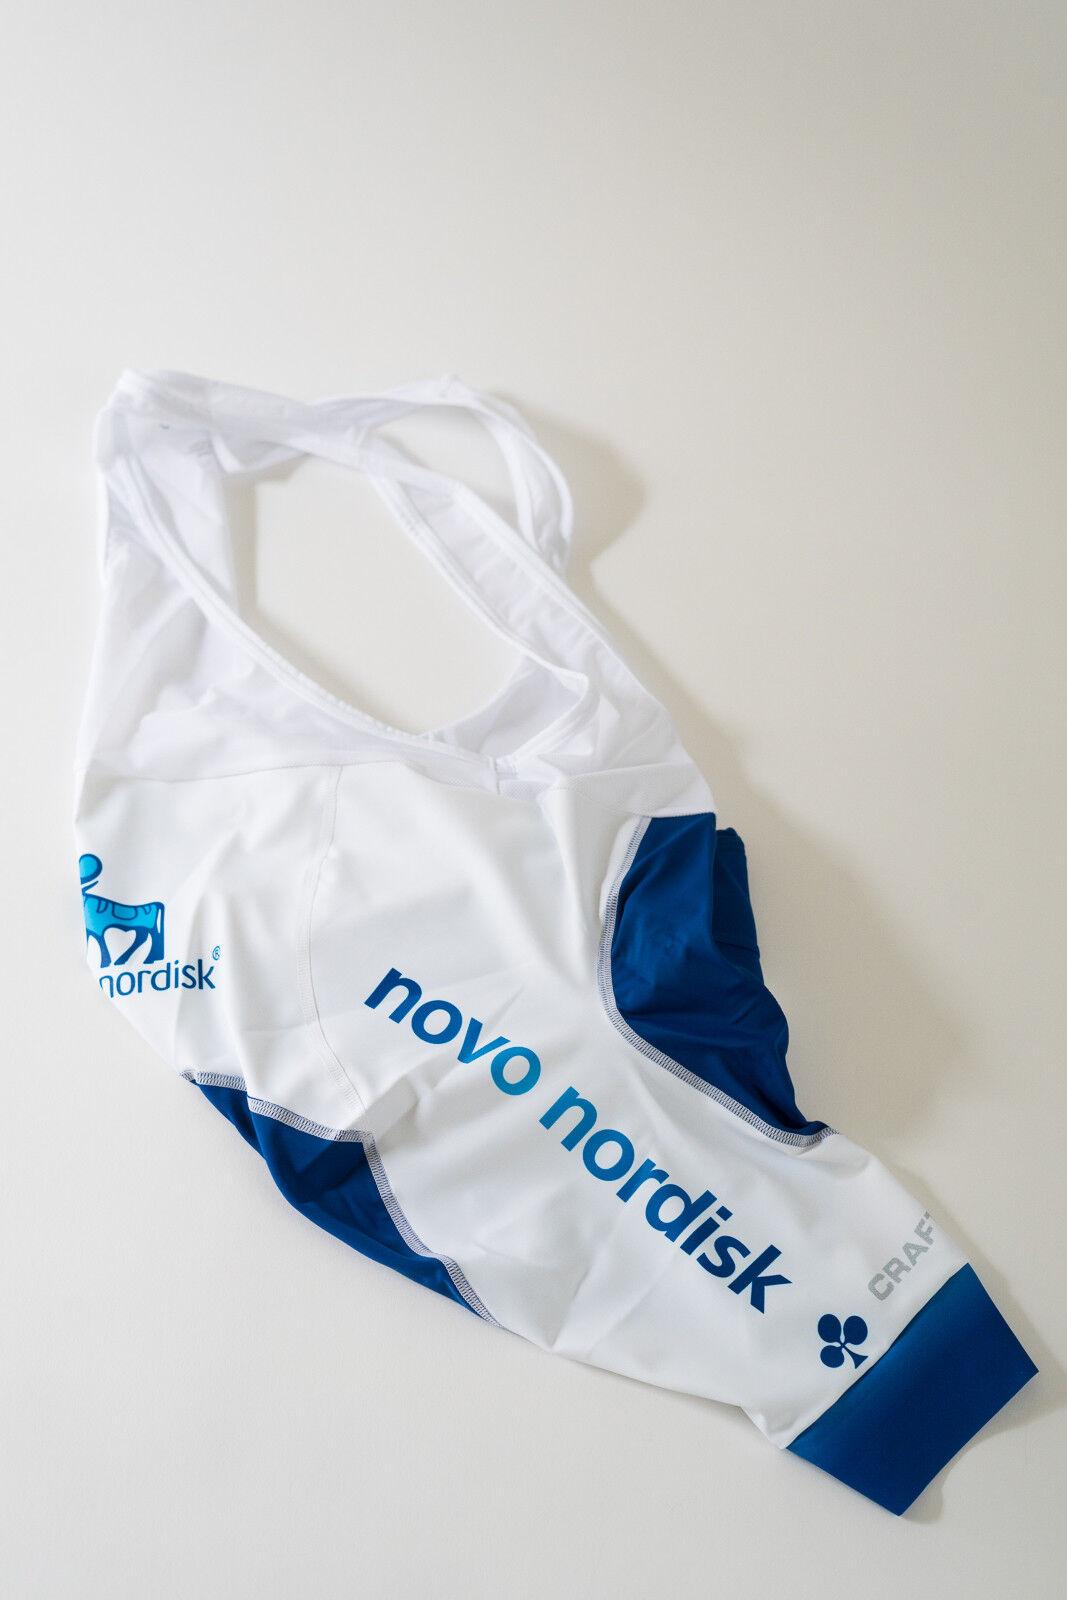 New Men's 2017 Craft Team Novo Nordisk PBC Cycling Bib Shorts, White, Size Large